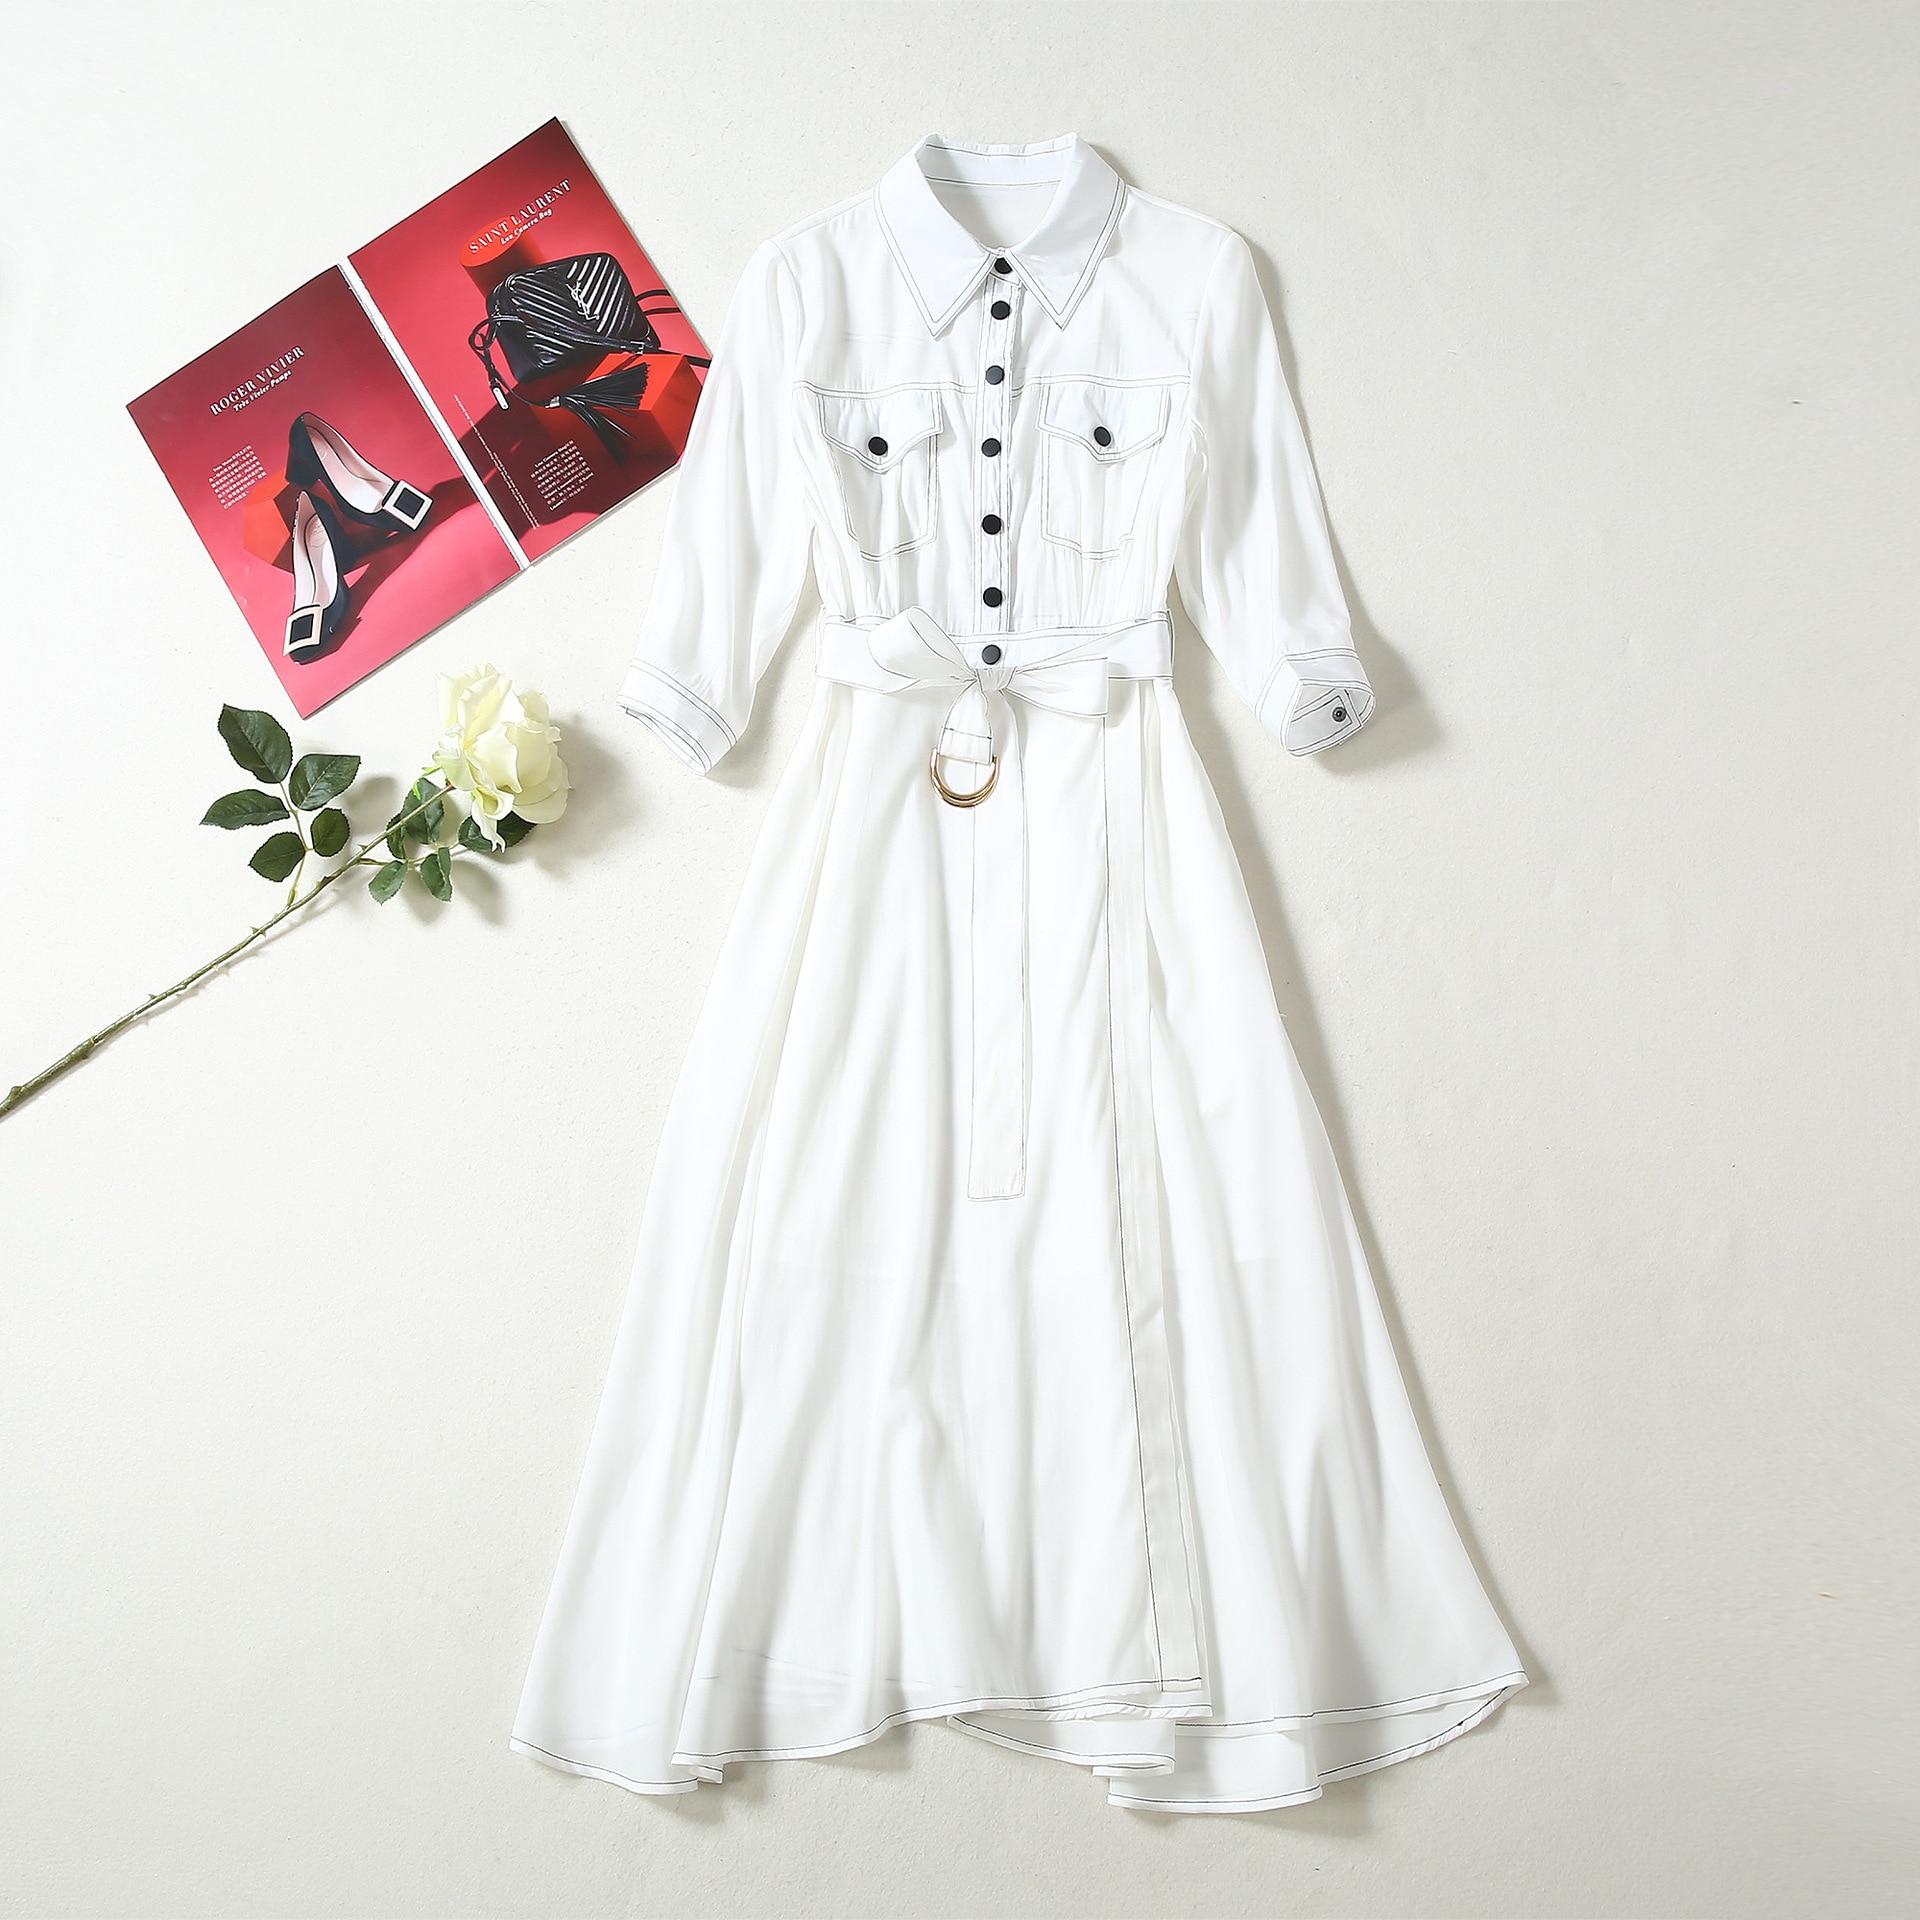 Outono Runway Designer Vestido de Mulheres de Alta Qualidade Turn down Collar Mangas 3/4 Plissadas Midi Vestido Elegante Das Senhoras Camisa Branca vestido